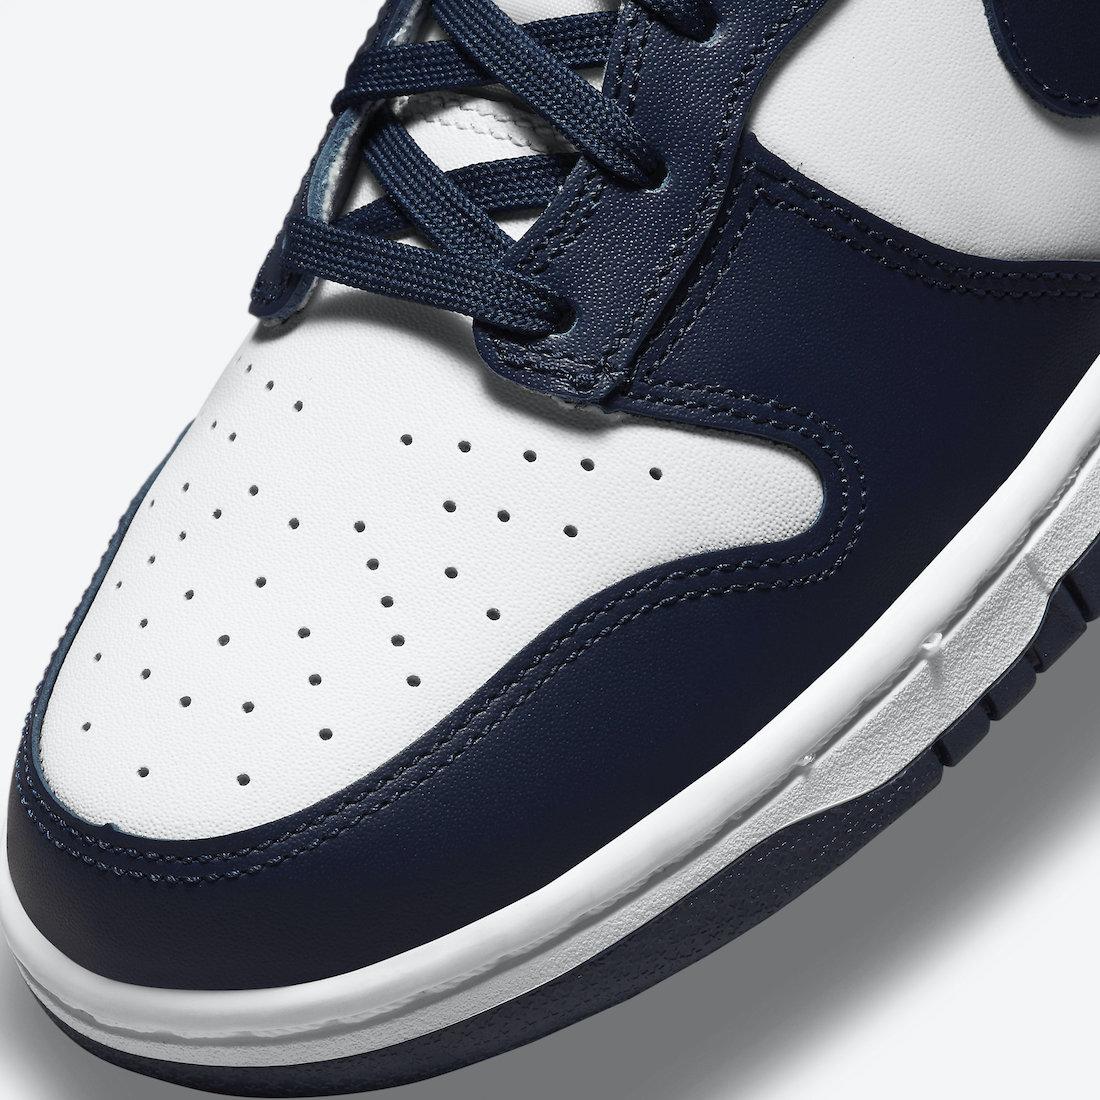 Nike-Dunk-High-Midnight-Navy-DD1399-104-Release-Date-Price-6